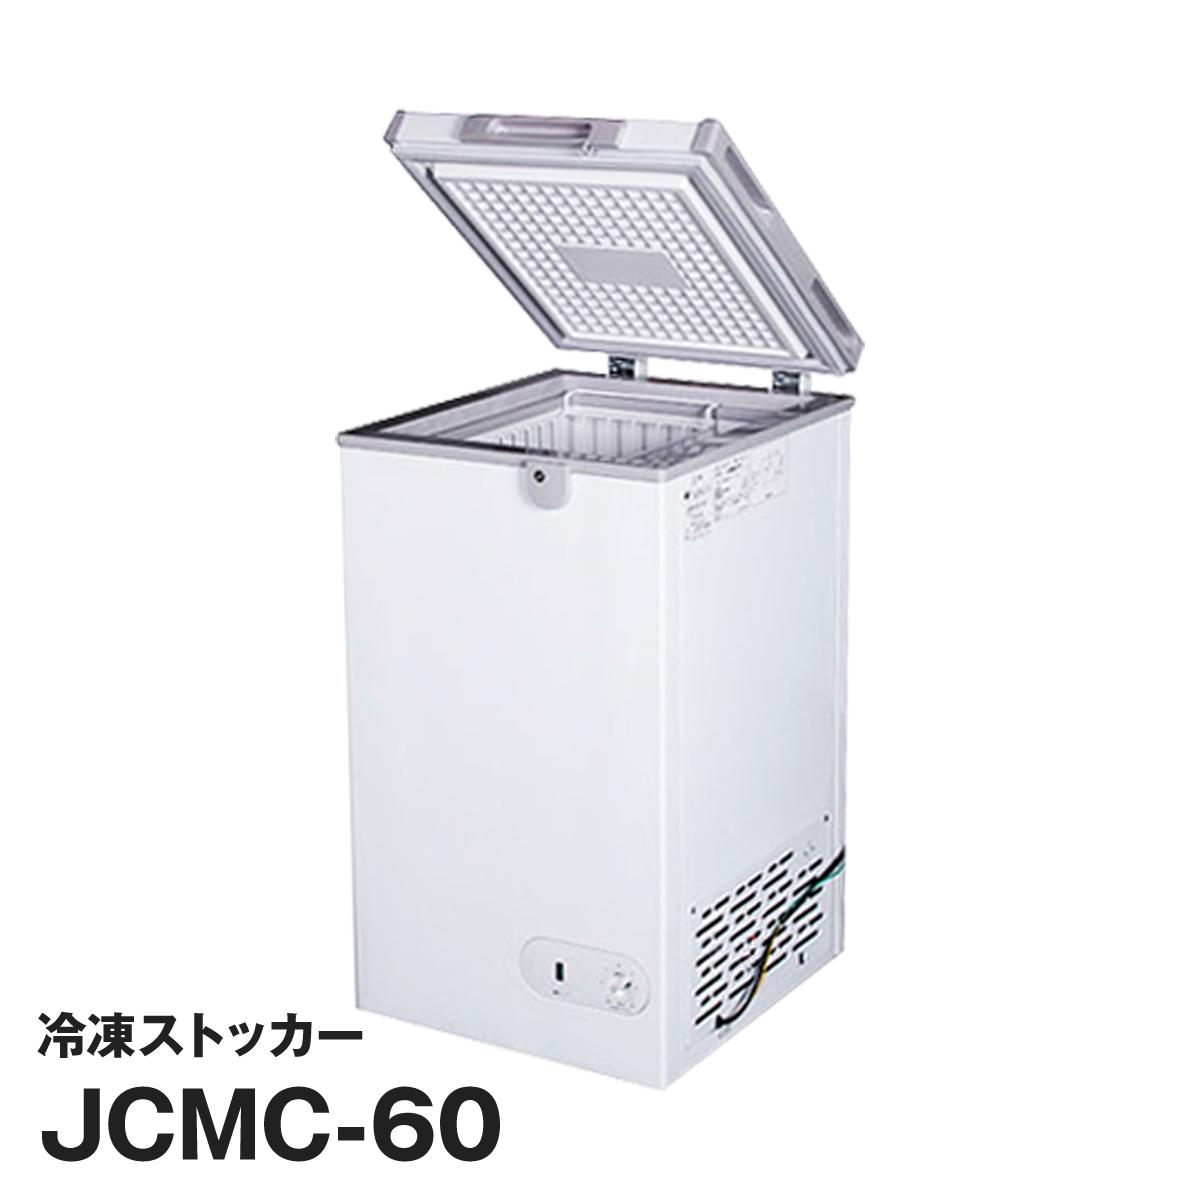 JCM社製 業務用 保冷庫 冷凍庫 65L 冷凍ストッカー JCMC-60 新品